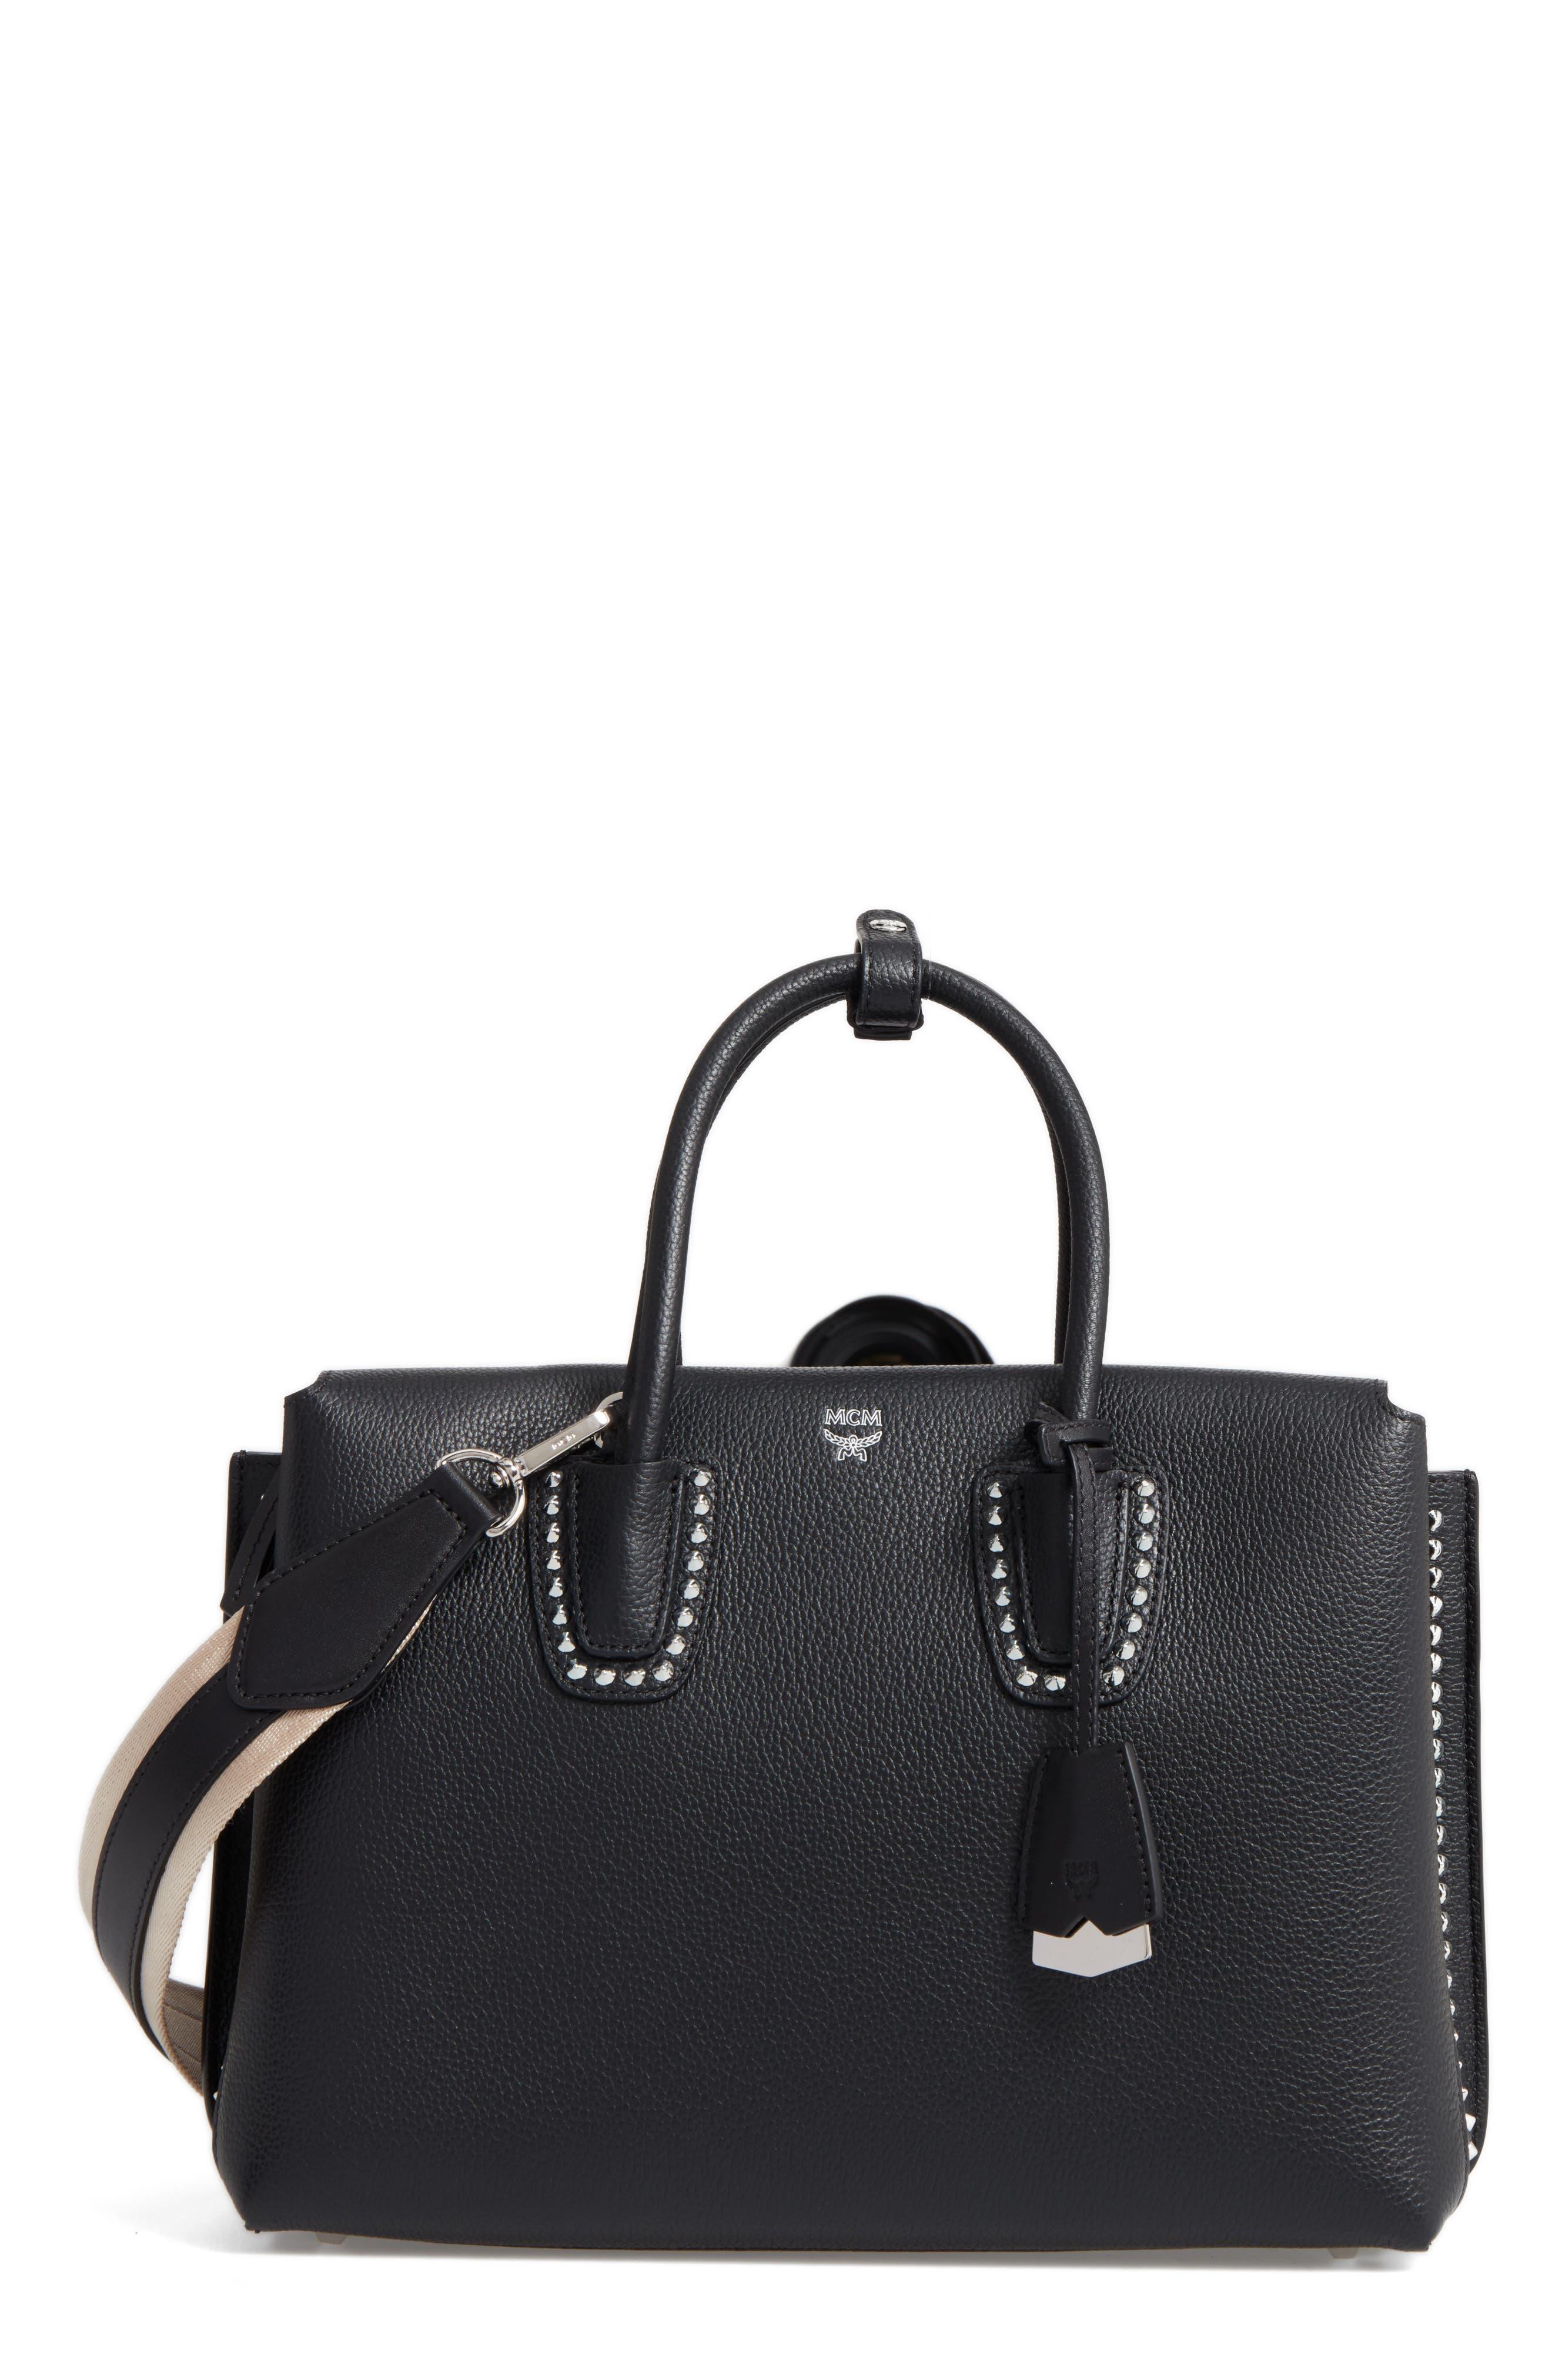 Medium Milla Studded Leather Tote,                         Main,                         color, Black